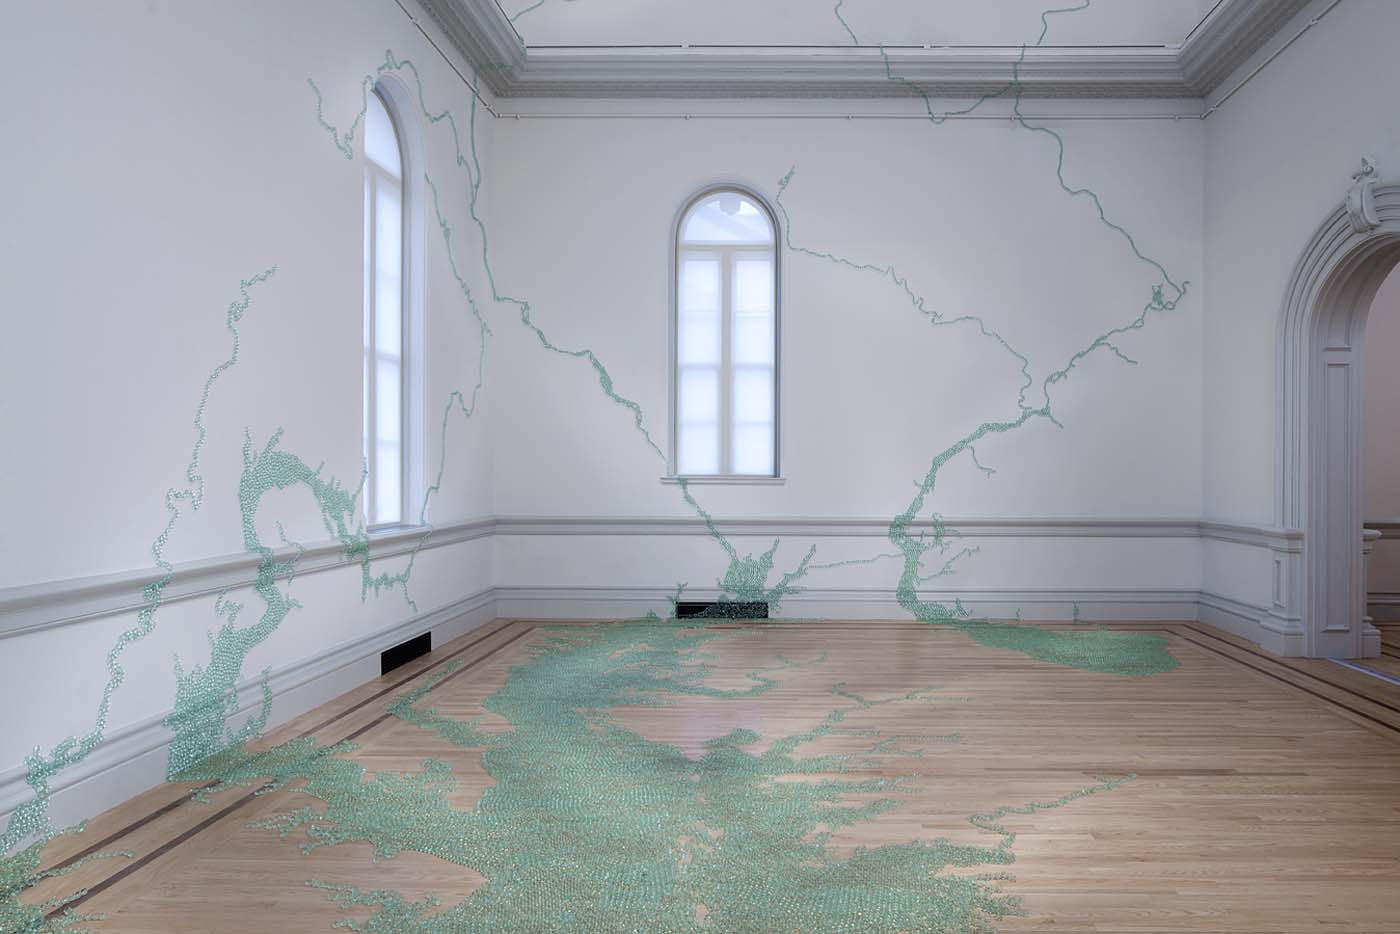 Title: Folding the Chesapeake, 2015 | Artist: Maya Lin | Source: Smithsonian American Art Museum, gift of Debbie Frank Petersen | ©2015, Maya Lin